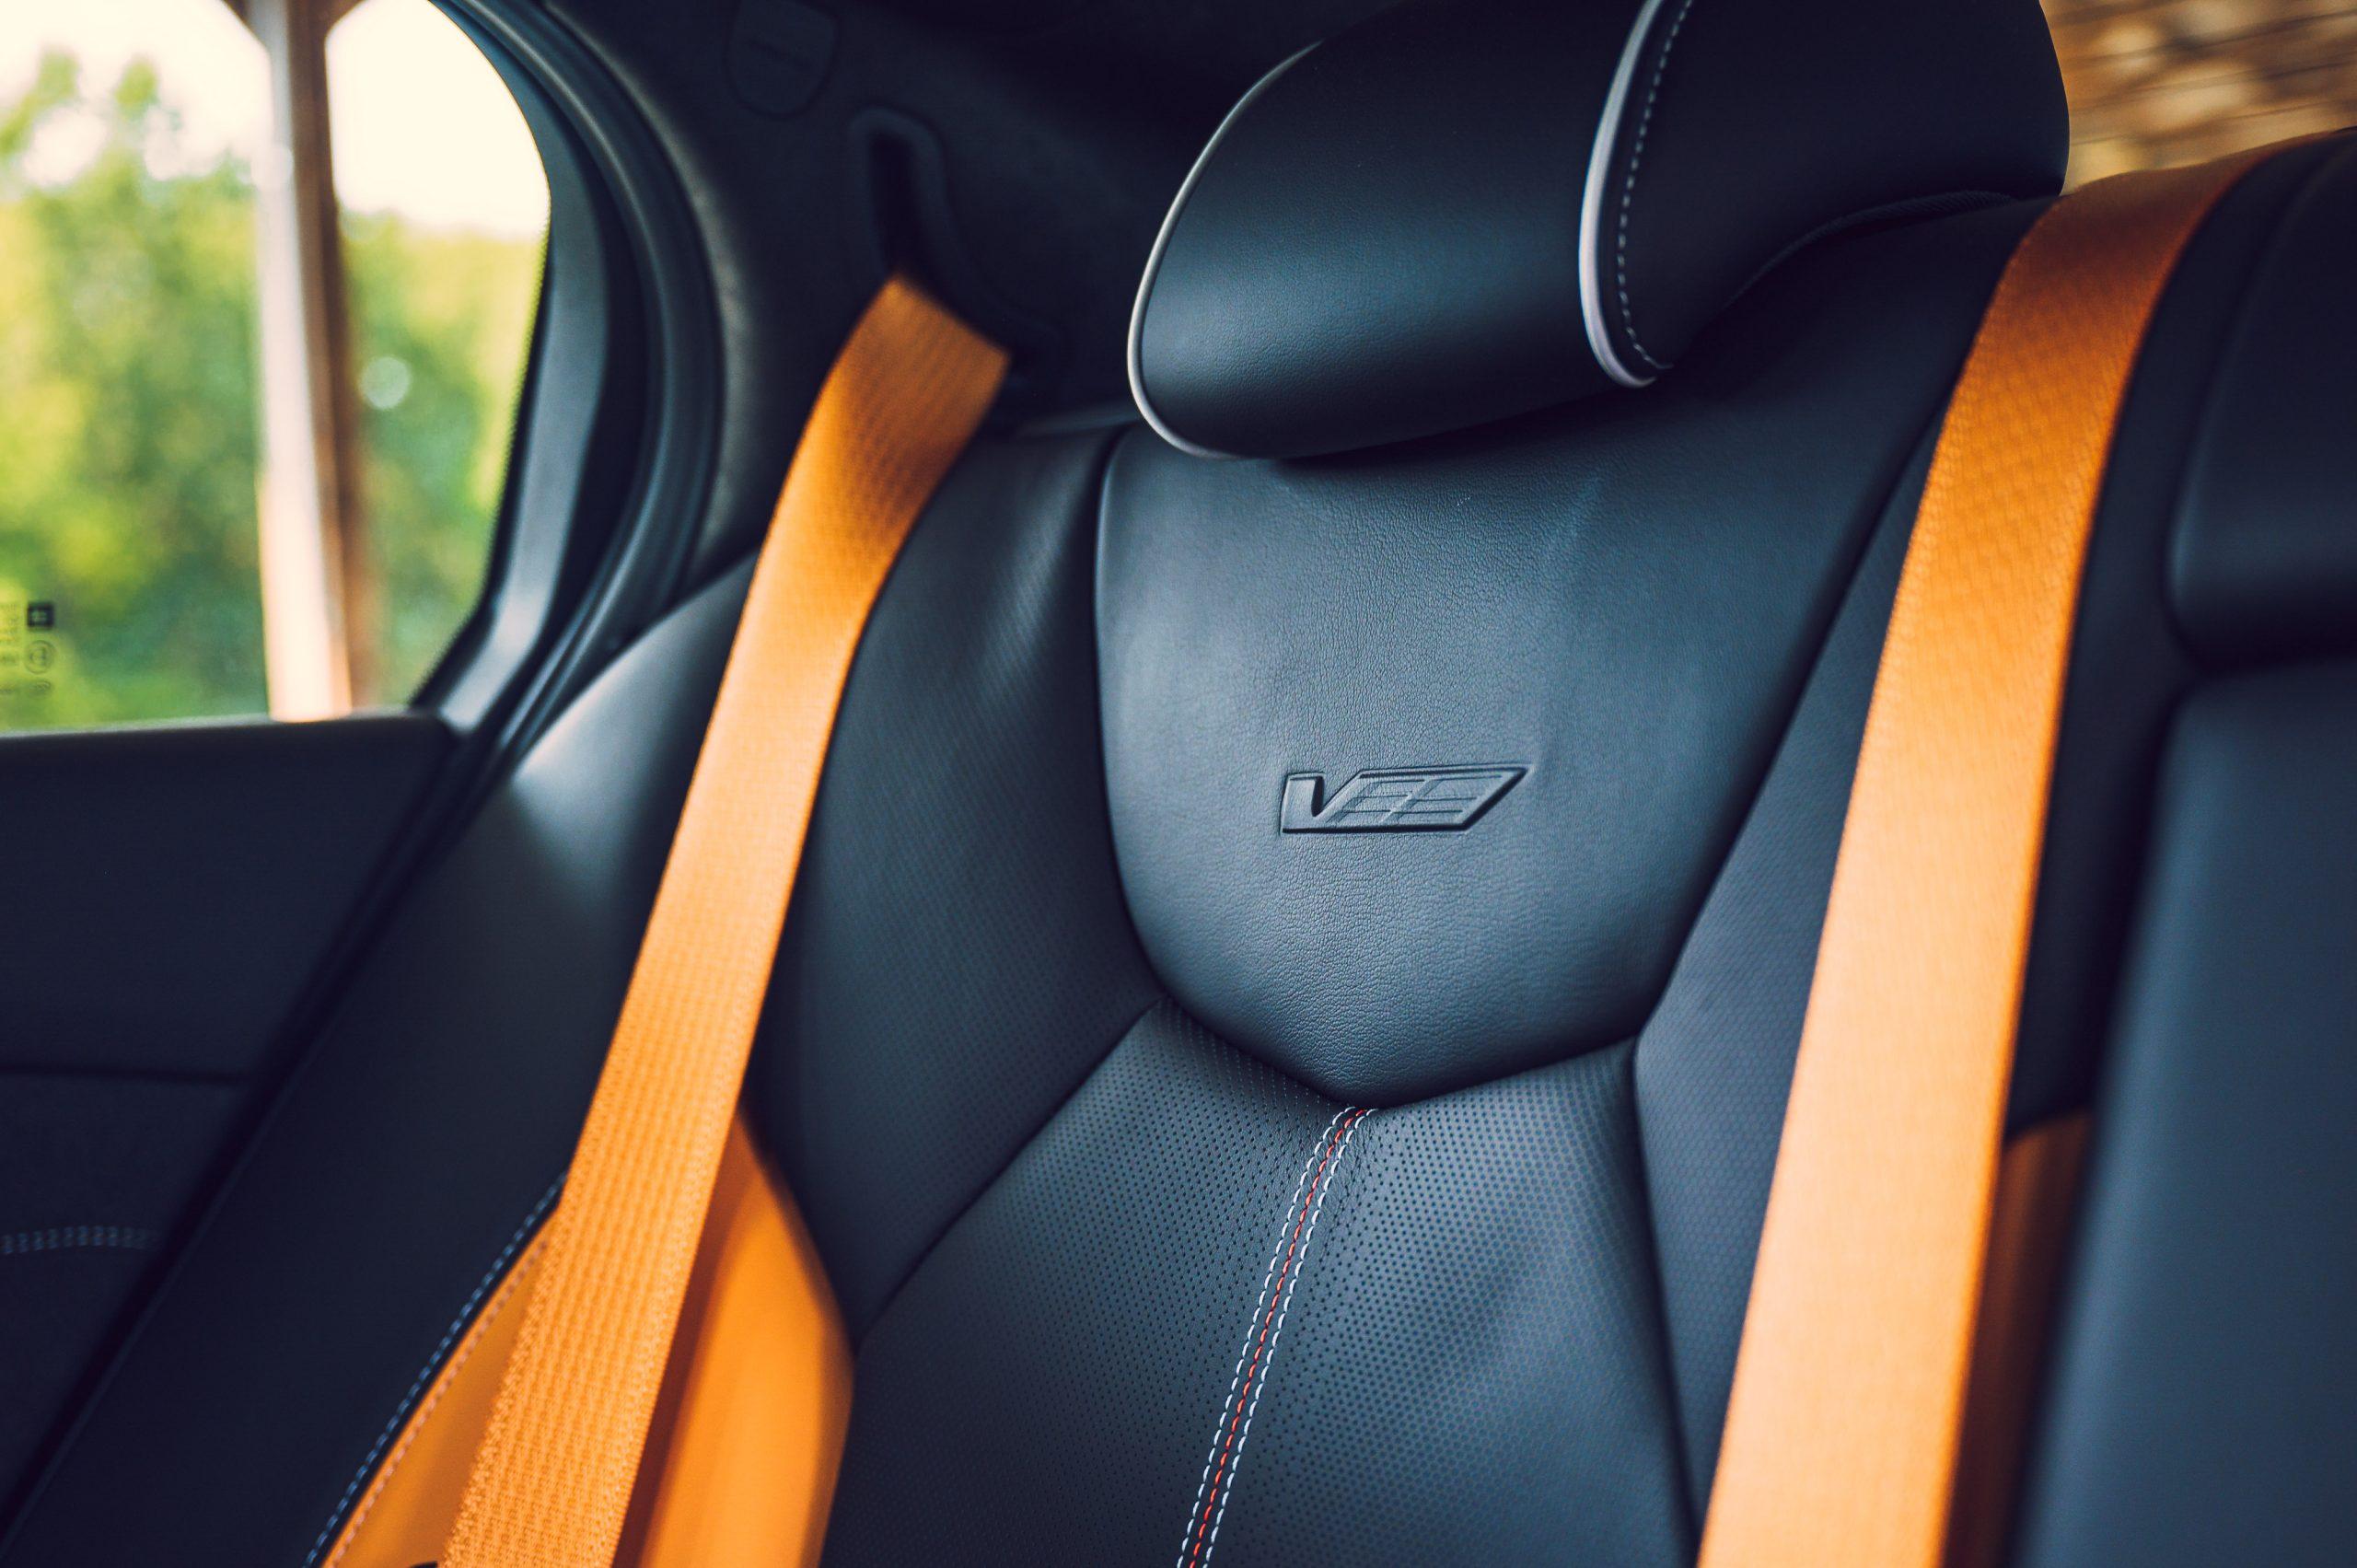 2022 Cadillac CT5-V Blackwing rear seat detail